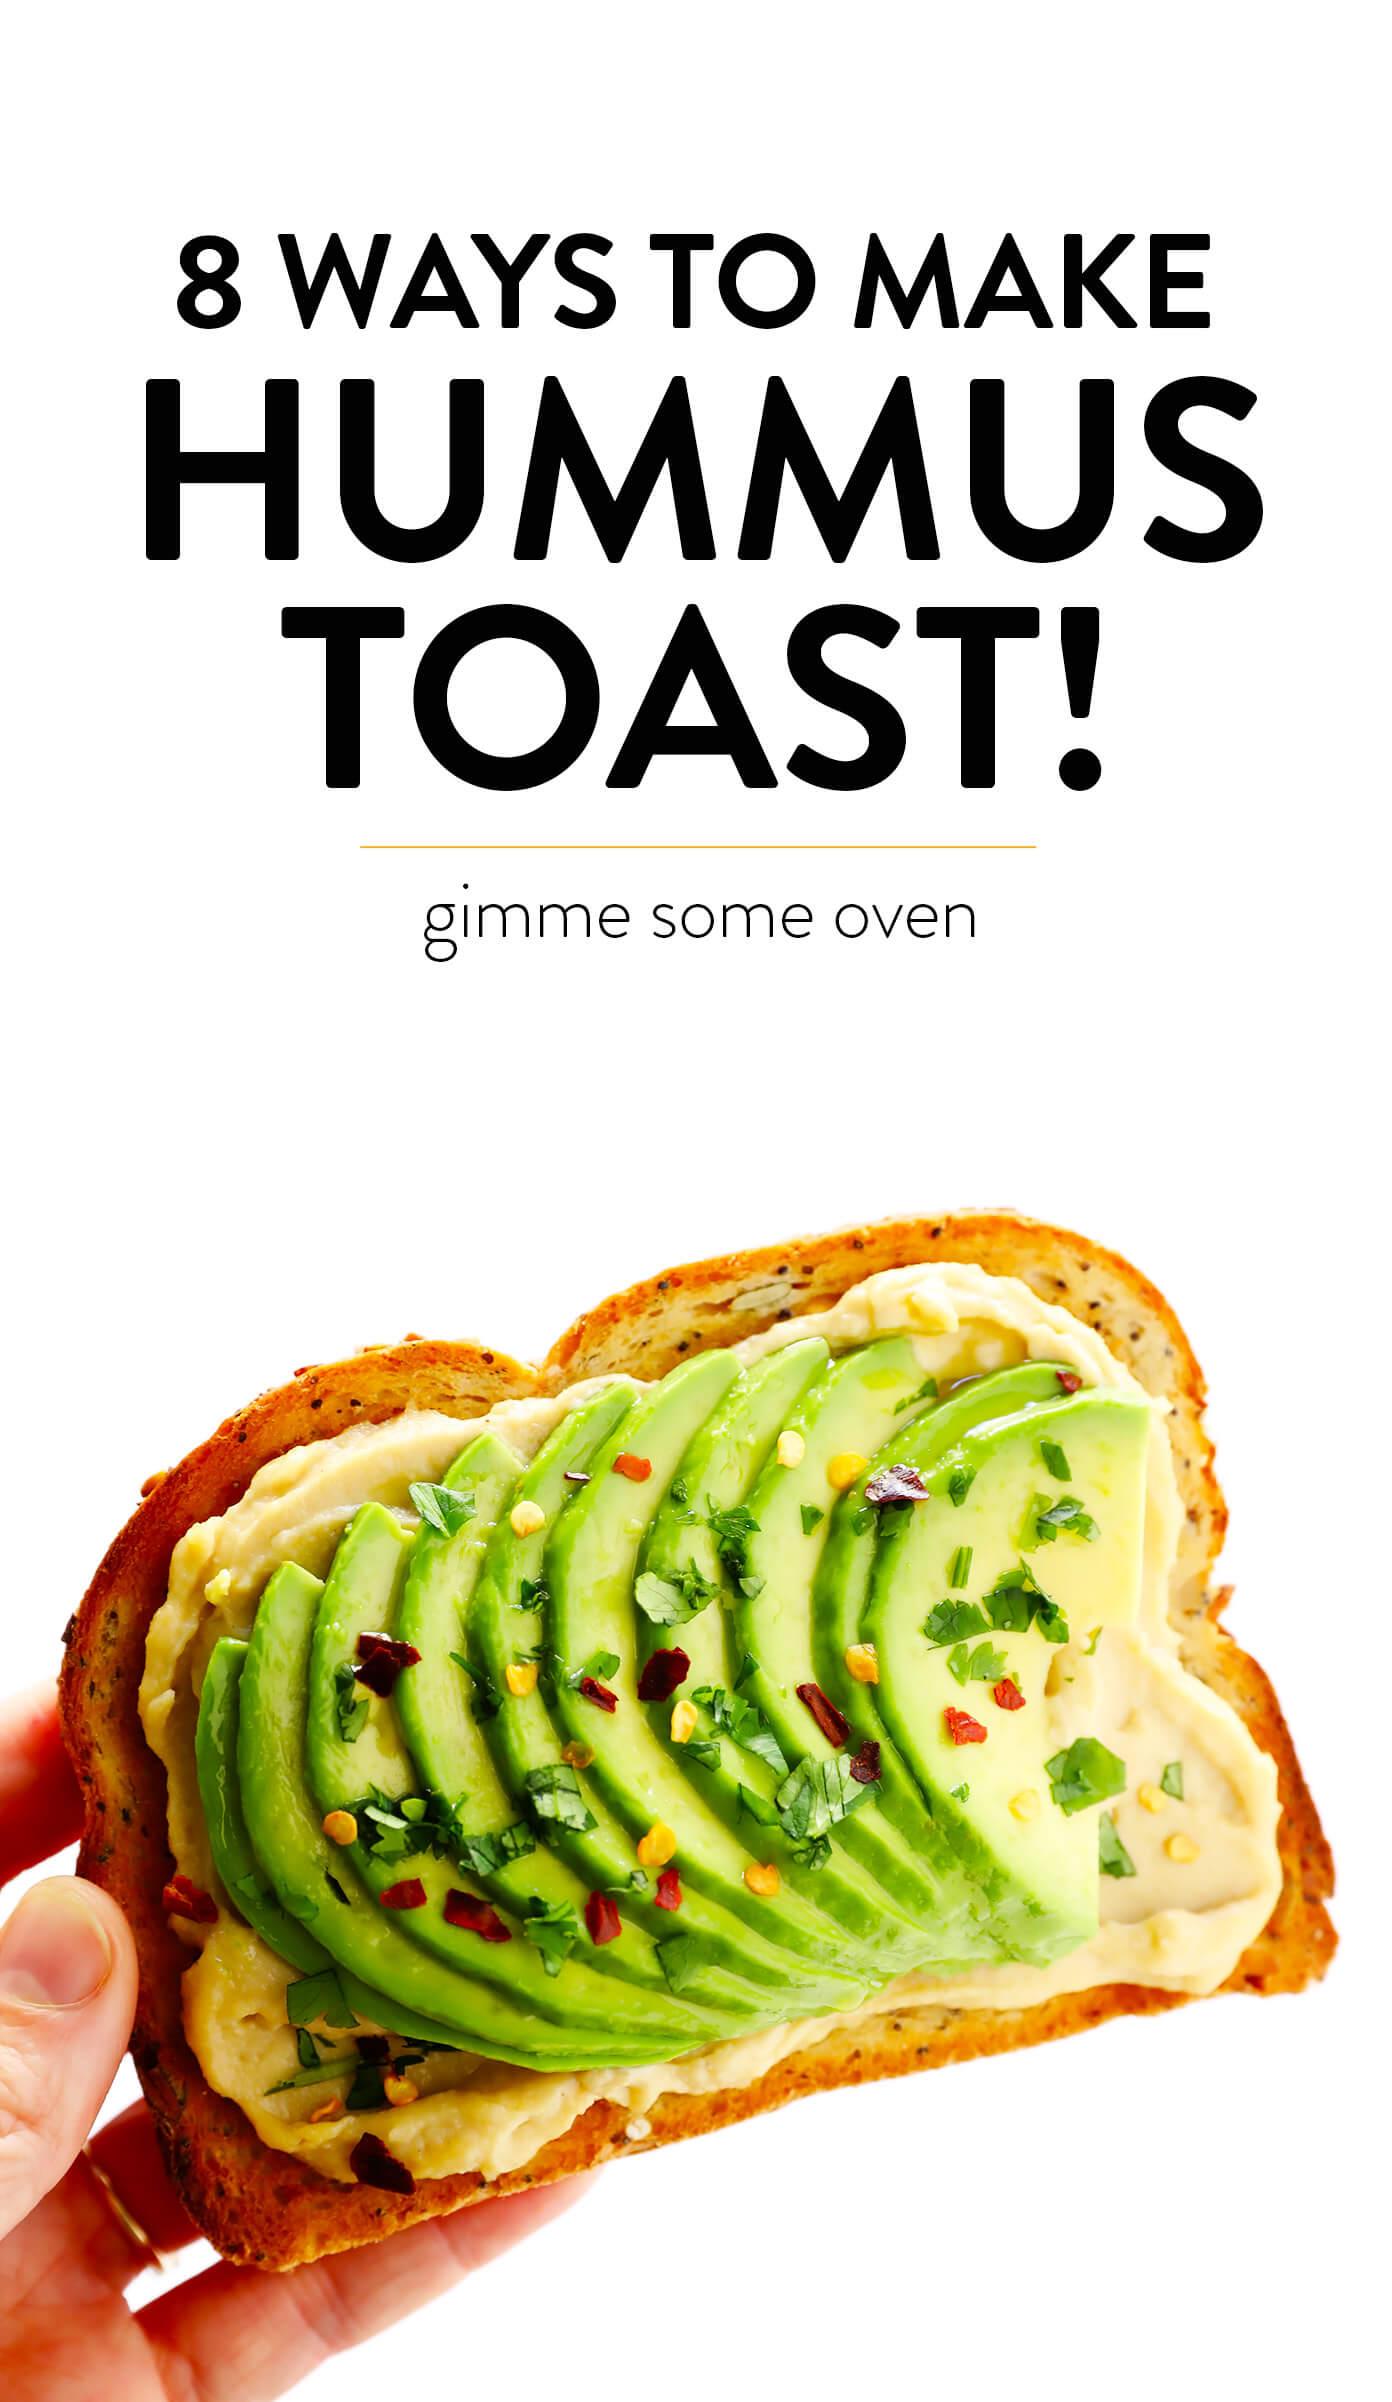 8 Ways To Make Hummus Toast